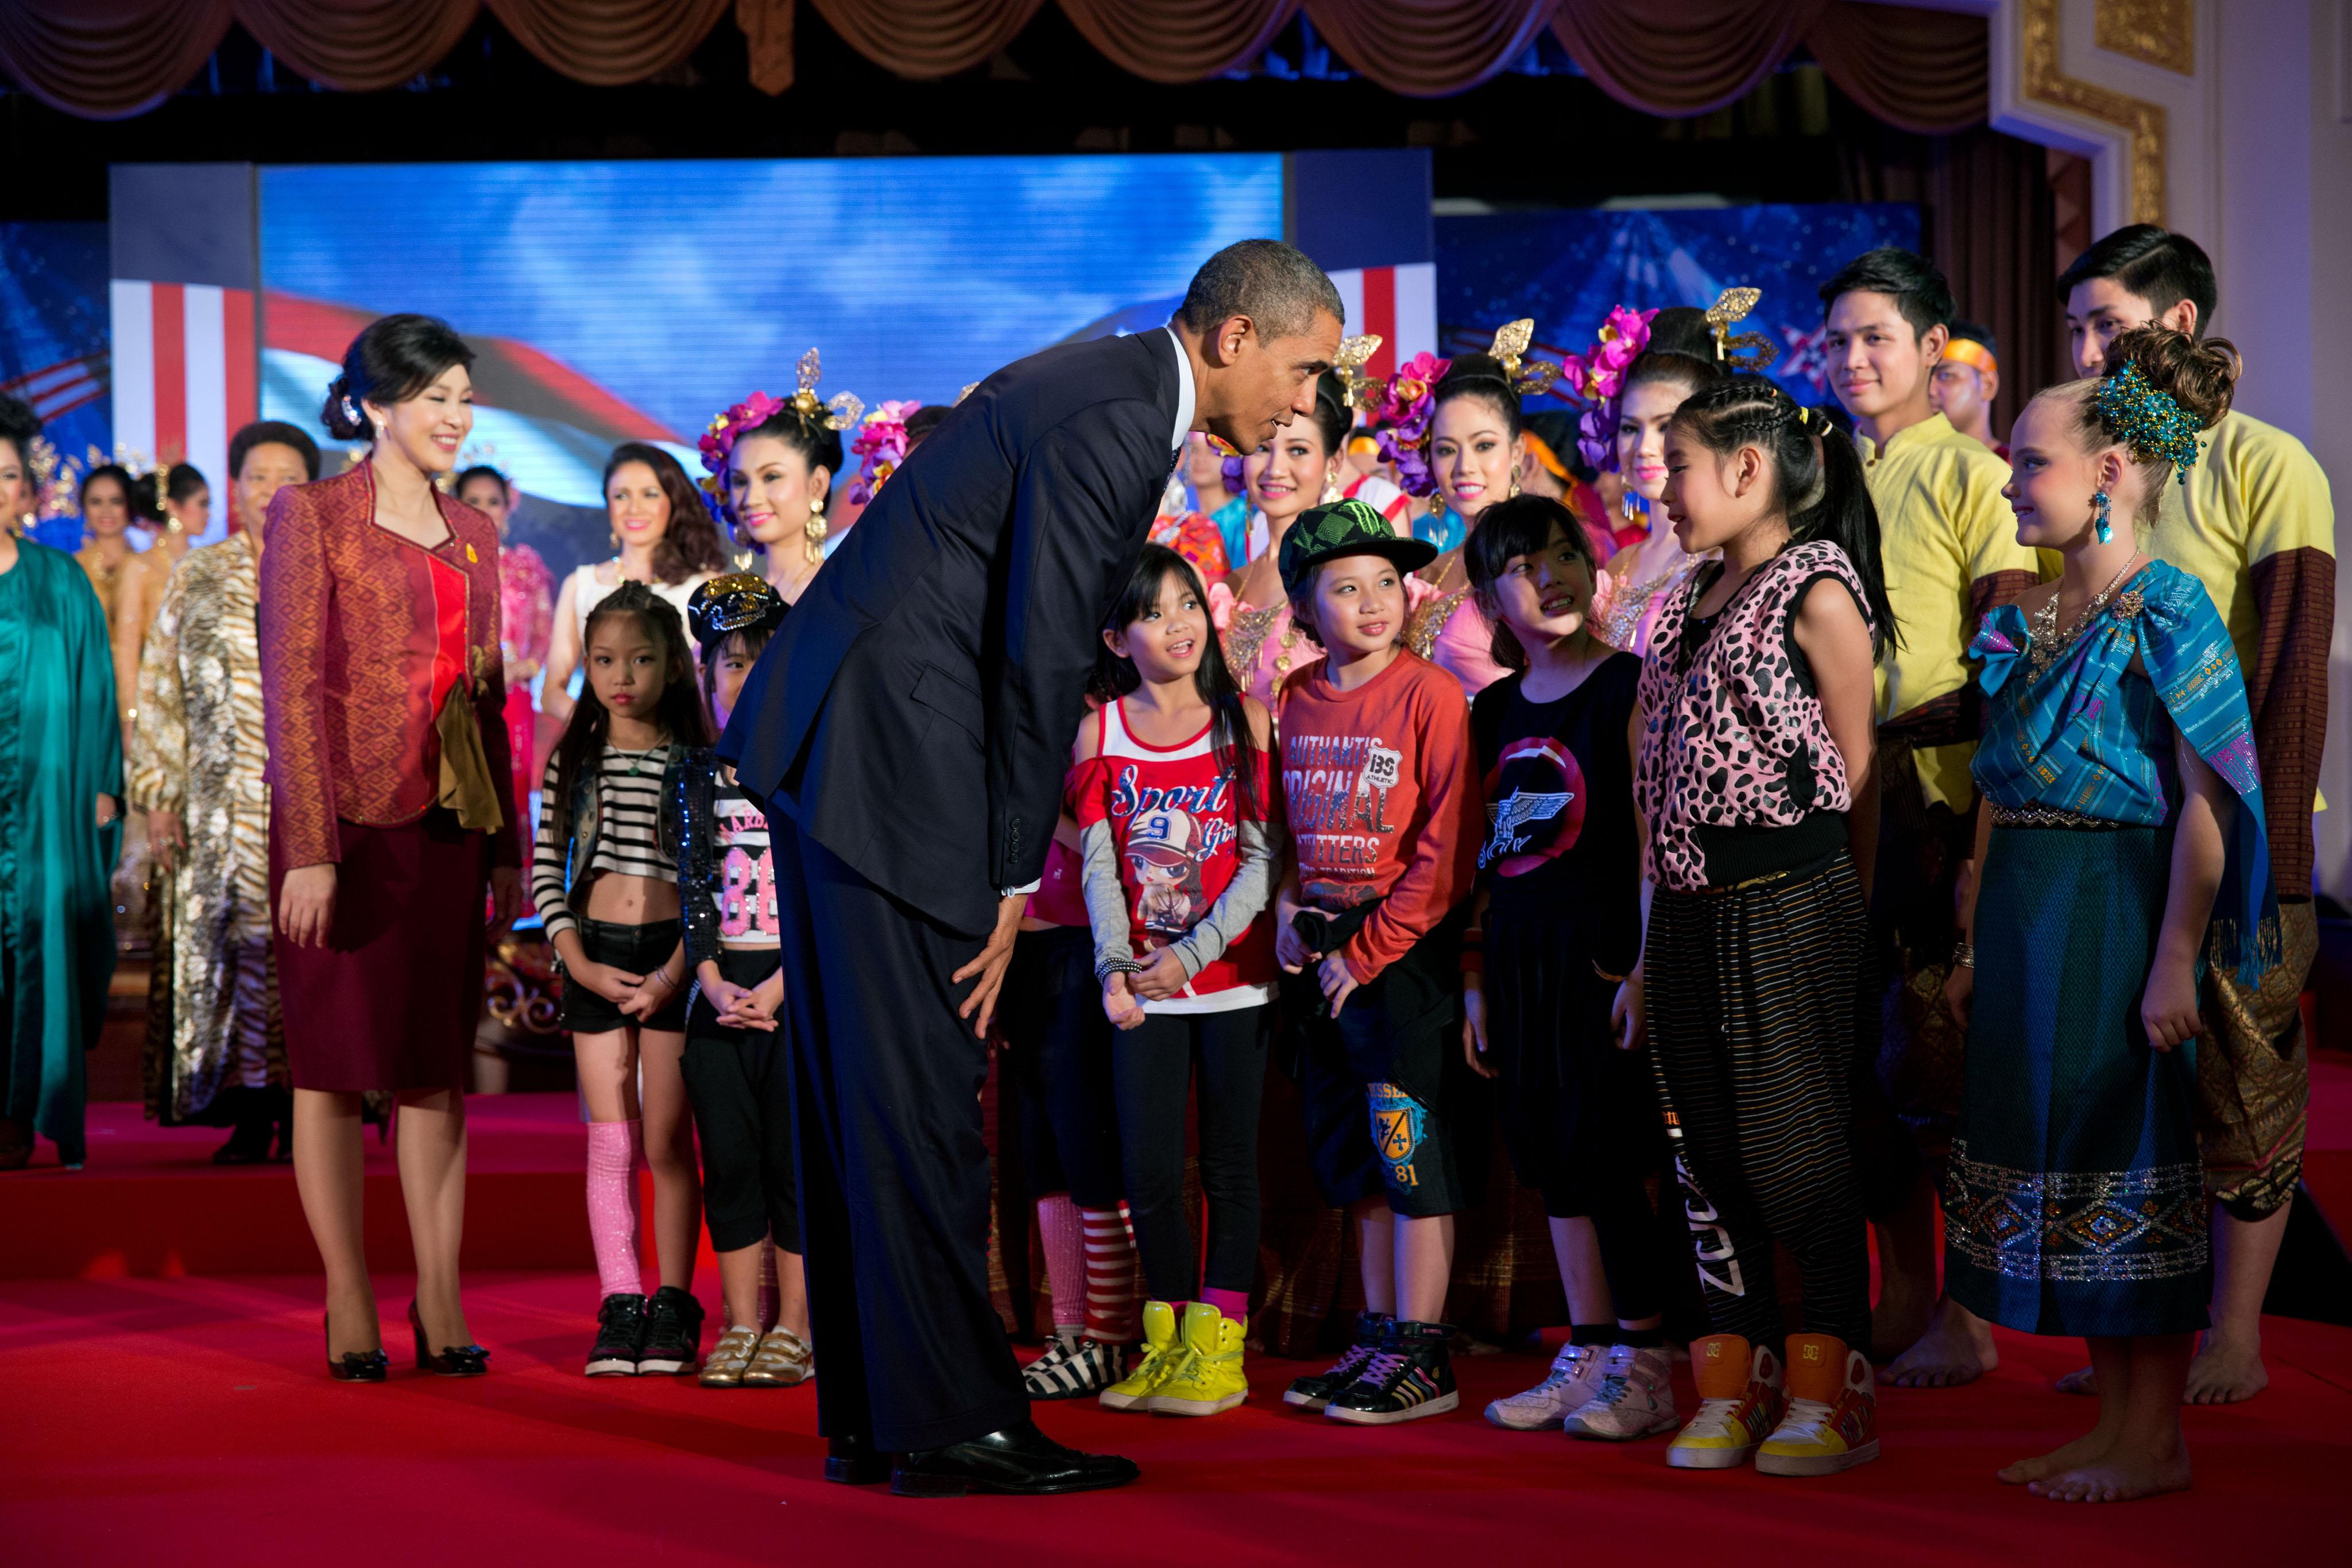 File:Yingluck Shinawatra and Barack Obama meet performers ...